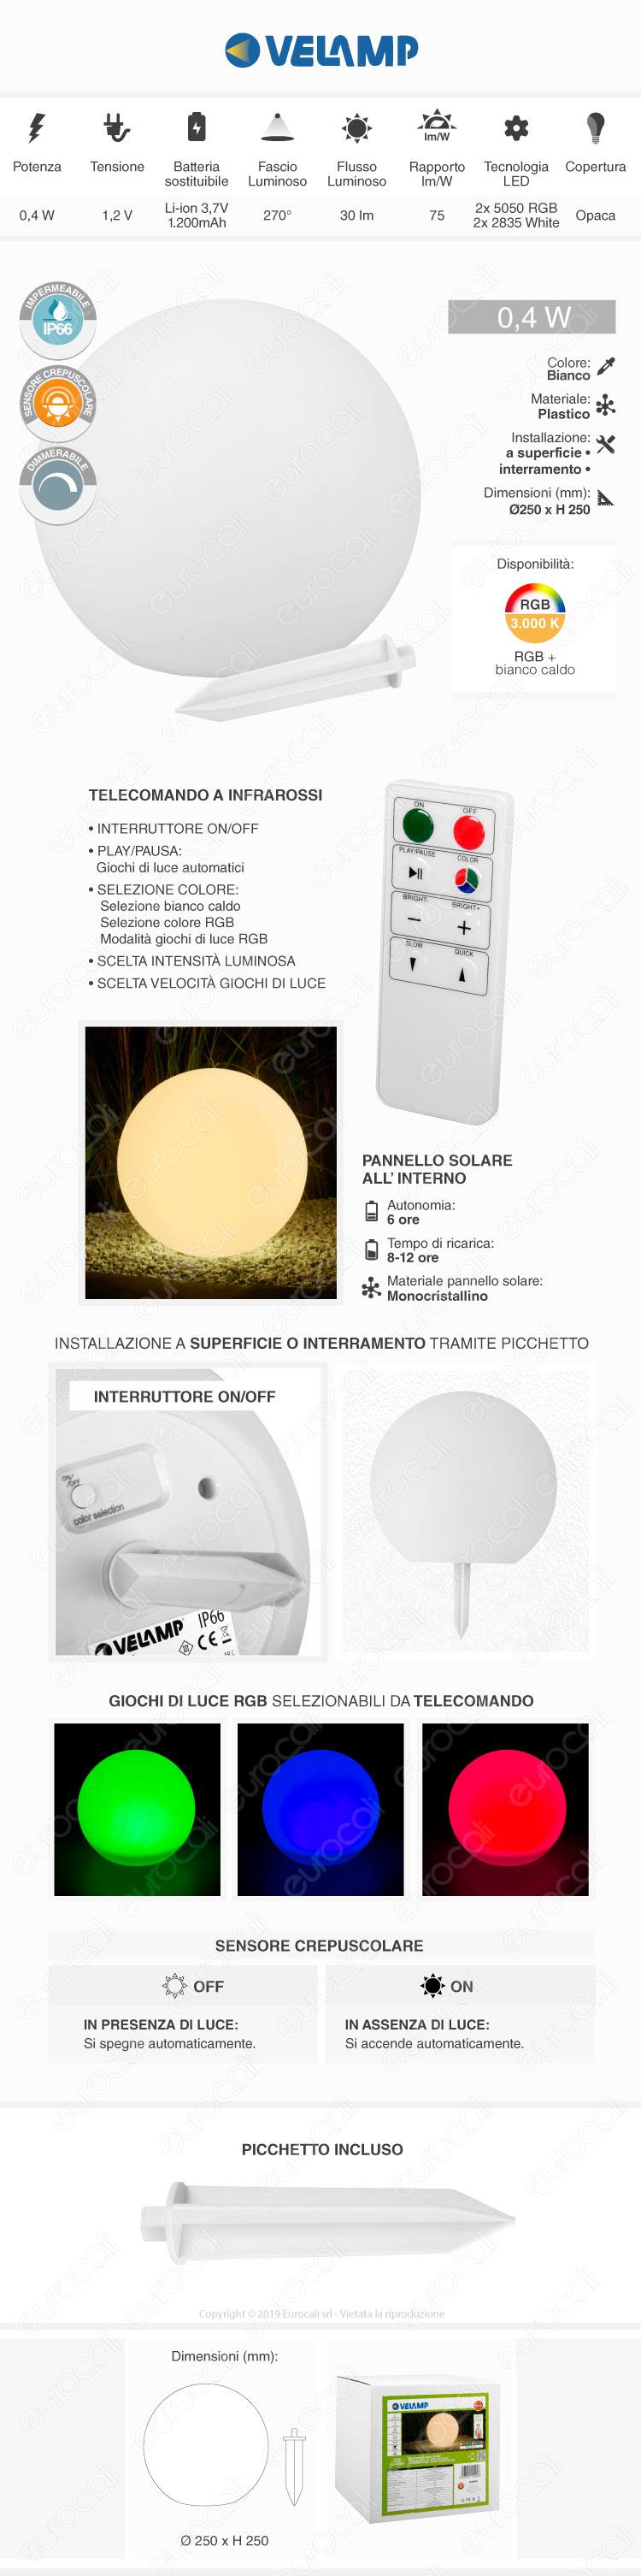 V-Tac VT-7815 Lampada Ovale con Luce LED RGB+W e Pannello Solare